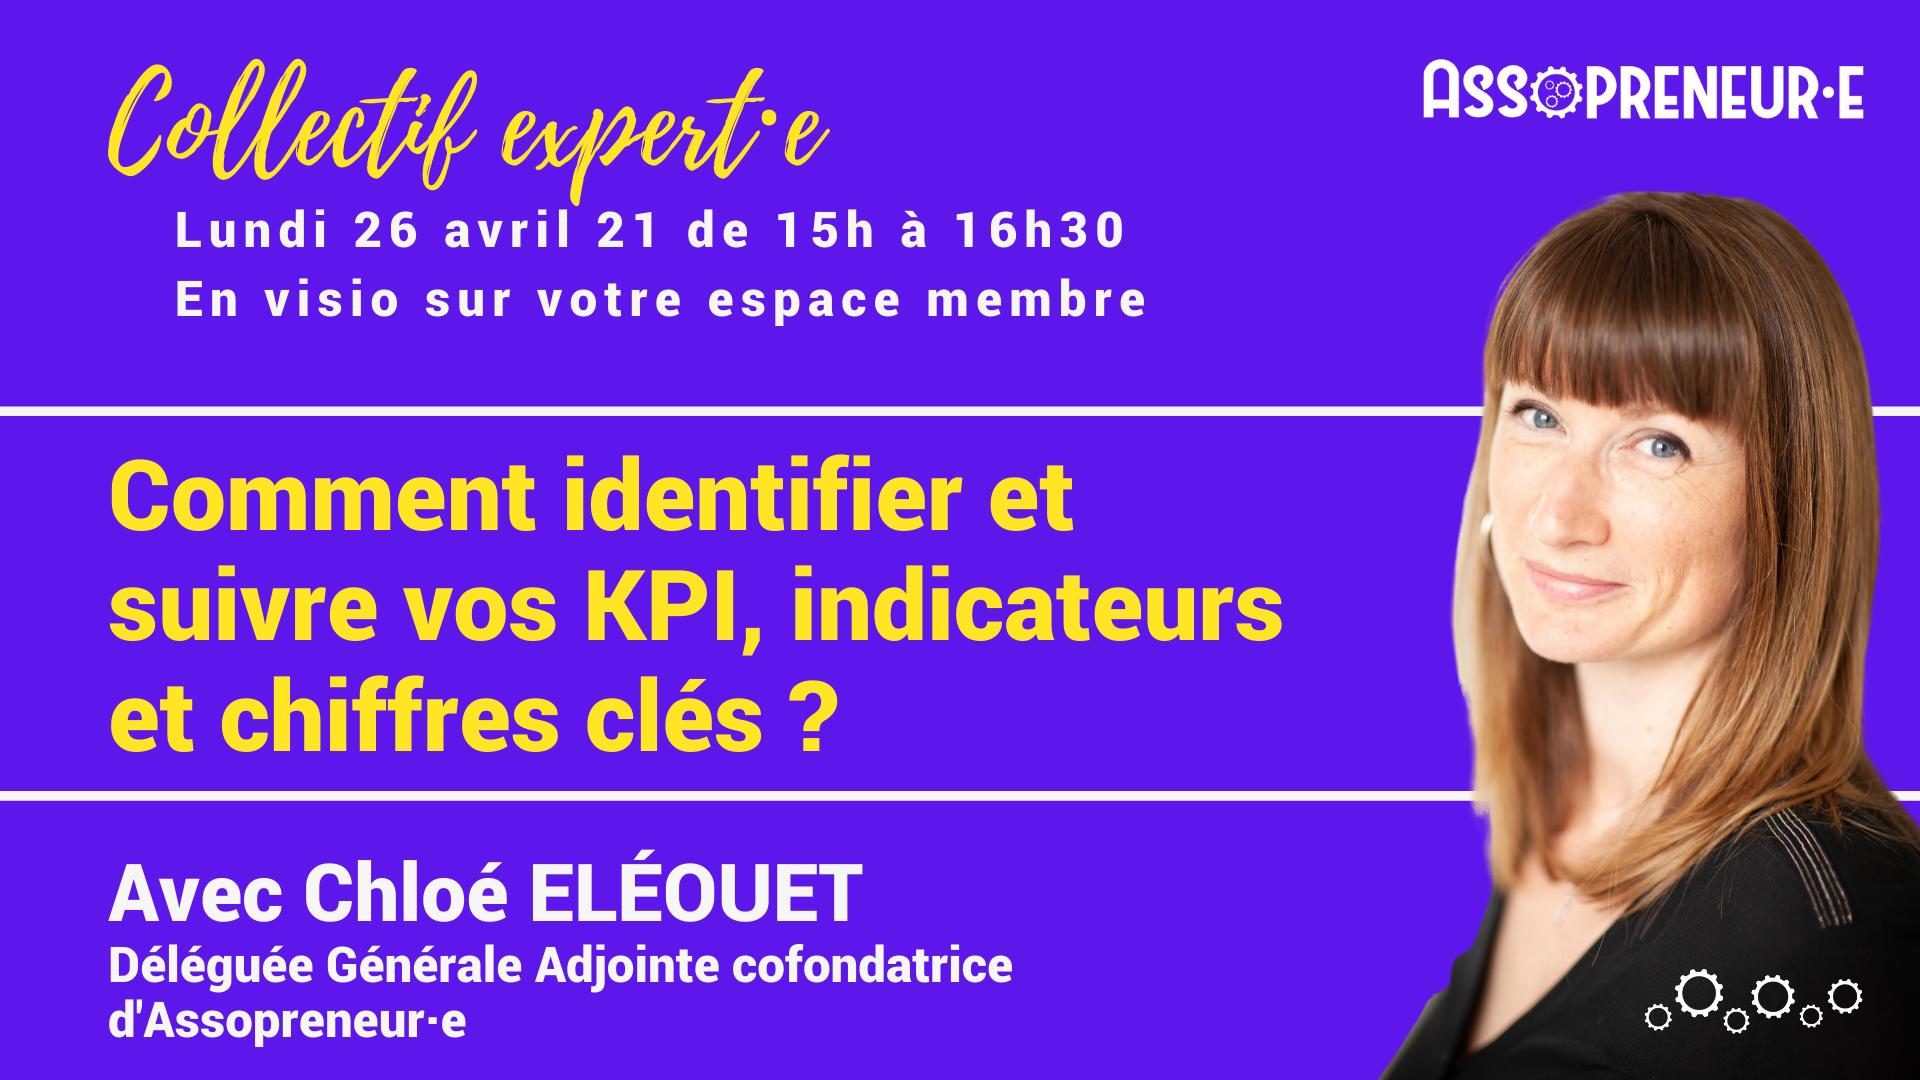 260421 Chloe Eleouet assopreneur chiffres cles KPI